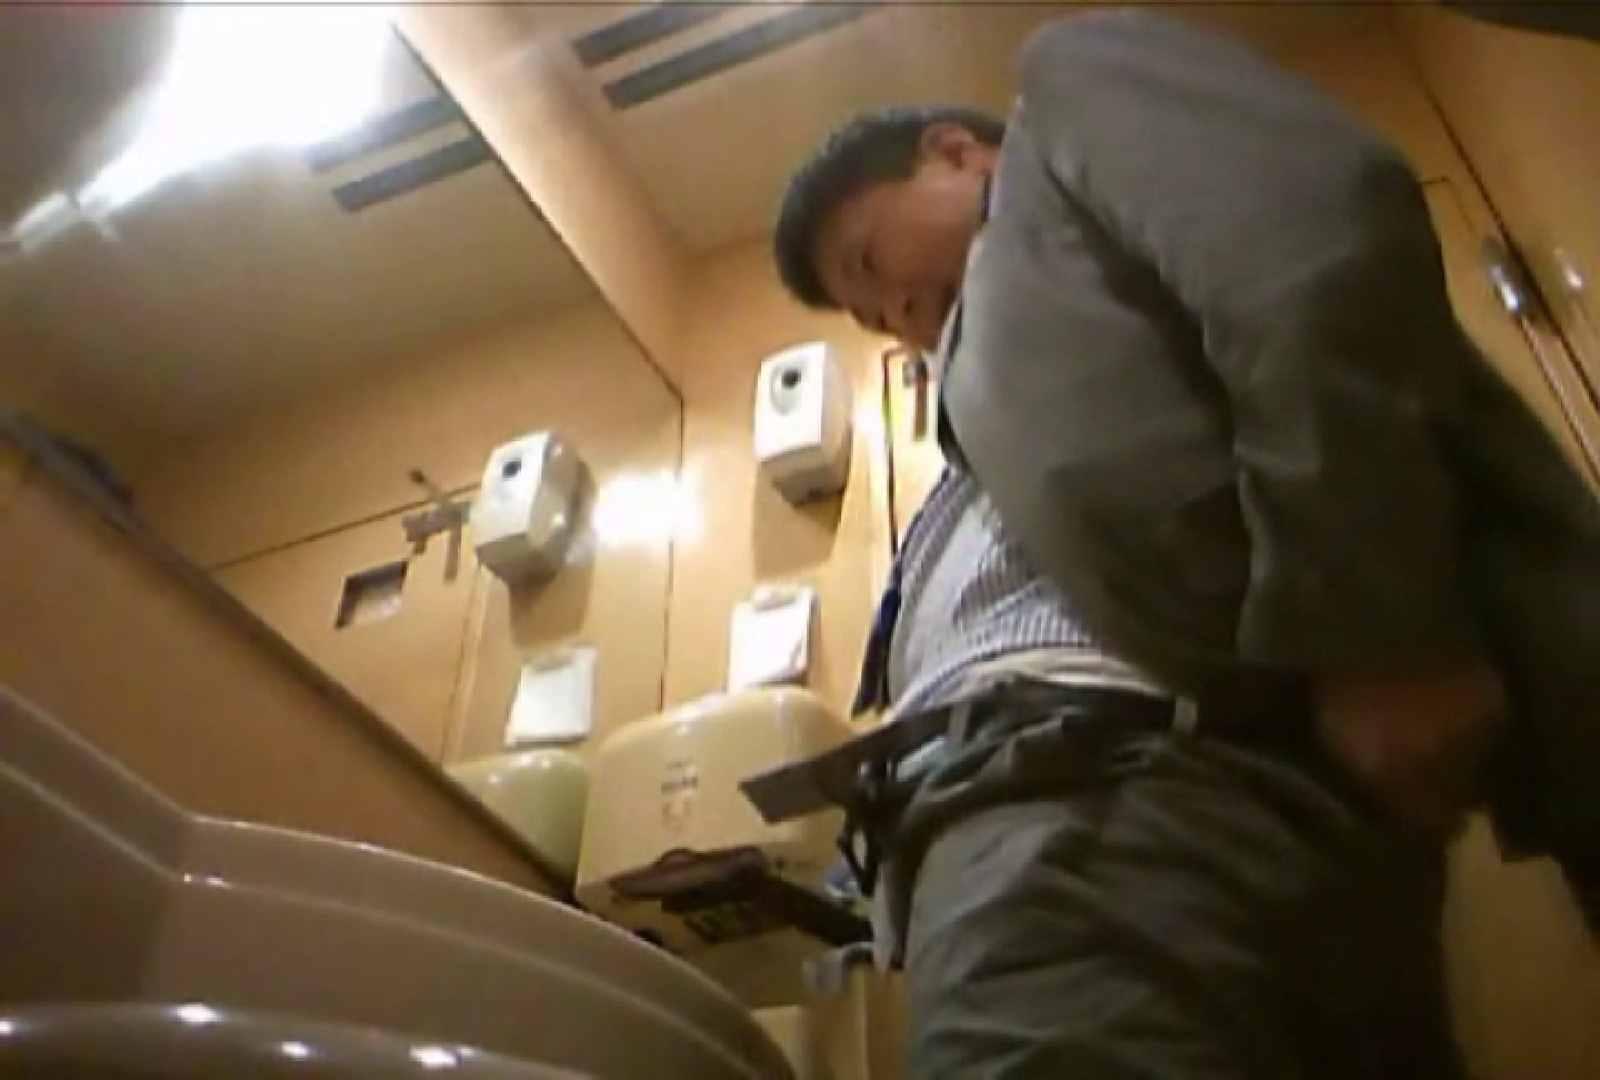 SEASON 2ND!掴み取りさんの洗面所覗き!in新幹線!VOL.02 スーツボーイズ | ノンケボーイズ  82pic 51